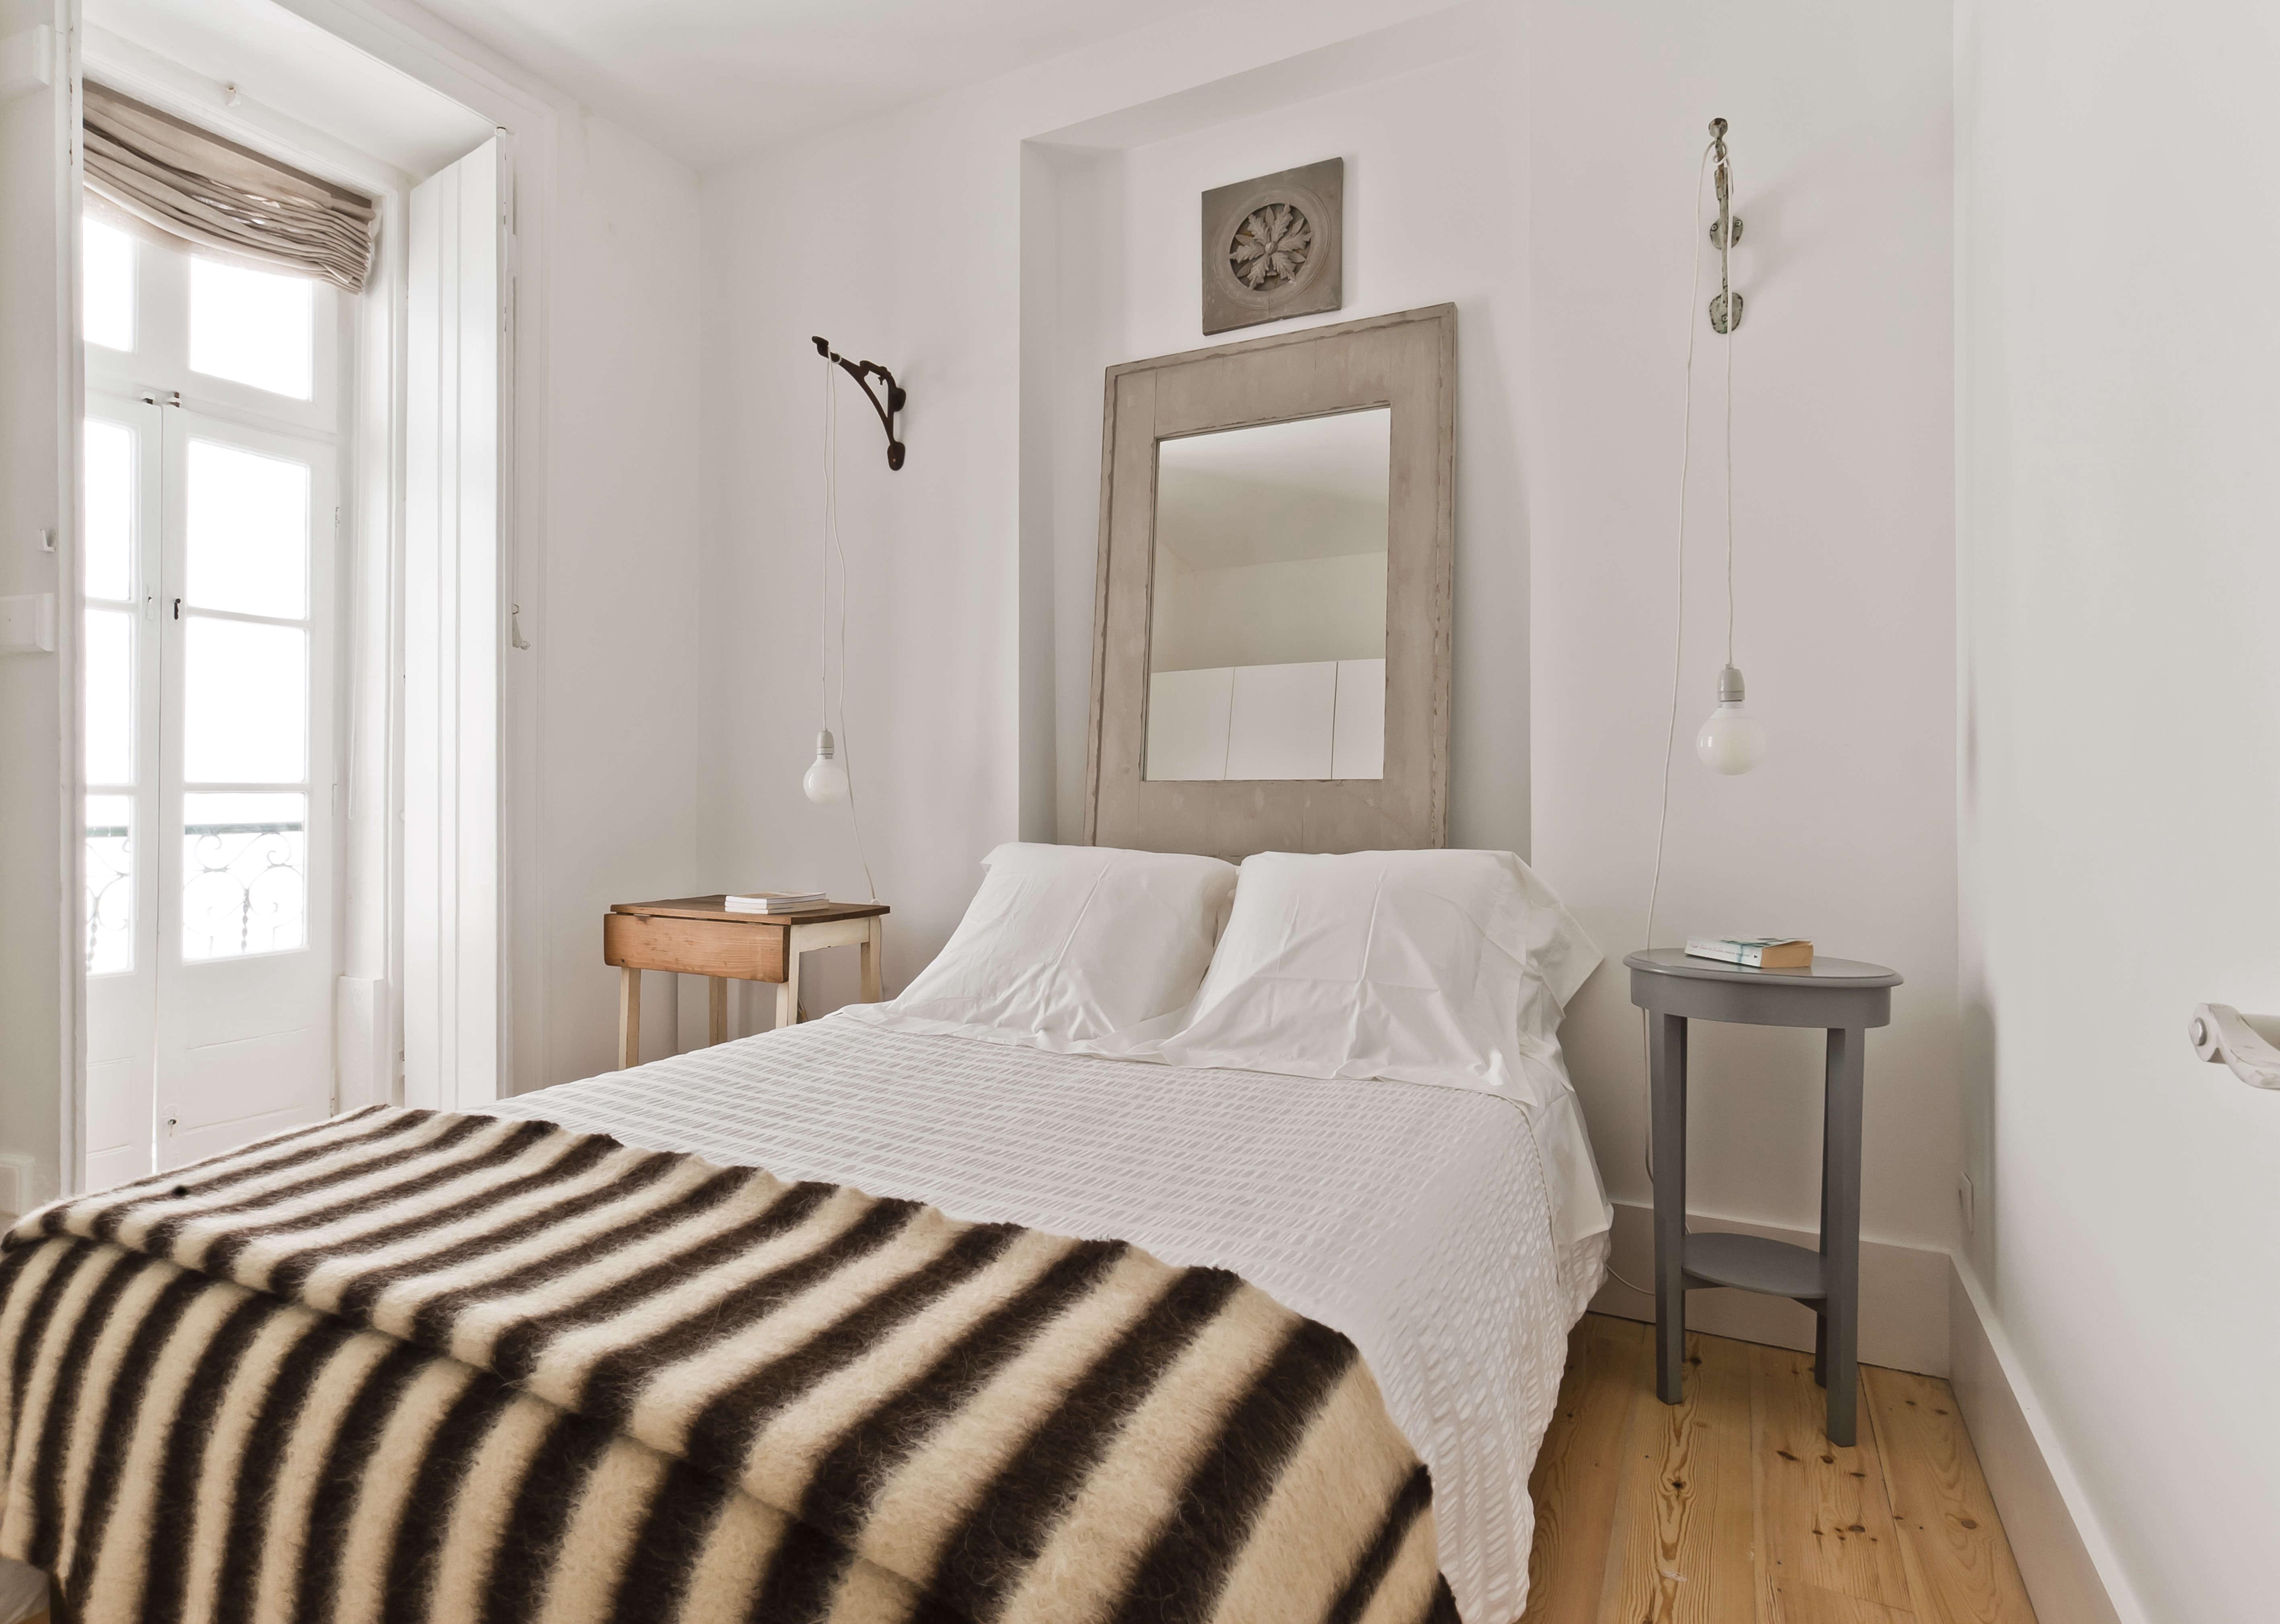 baixa house bedroom in lisbon, portugal 11